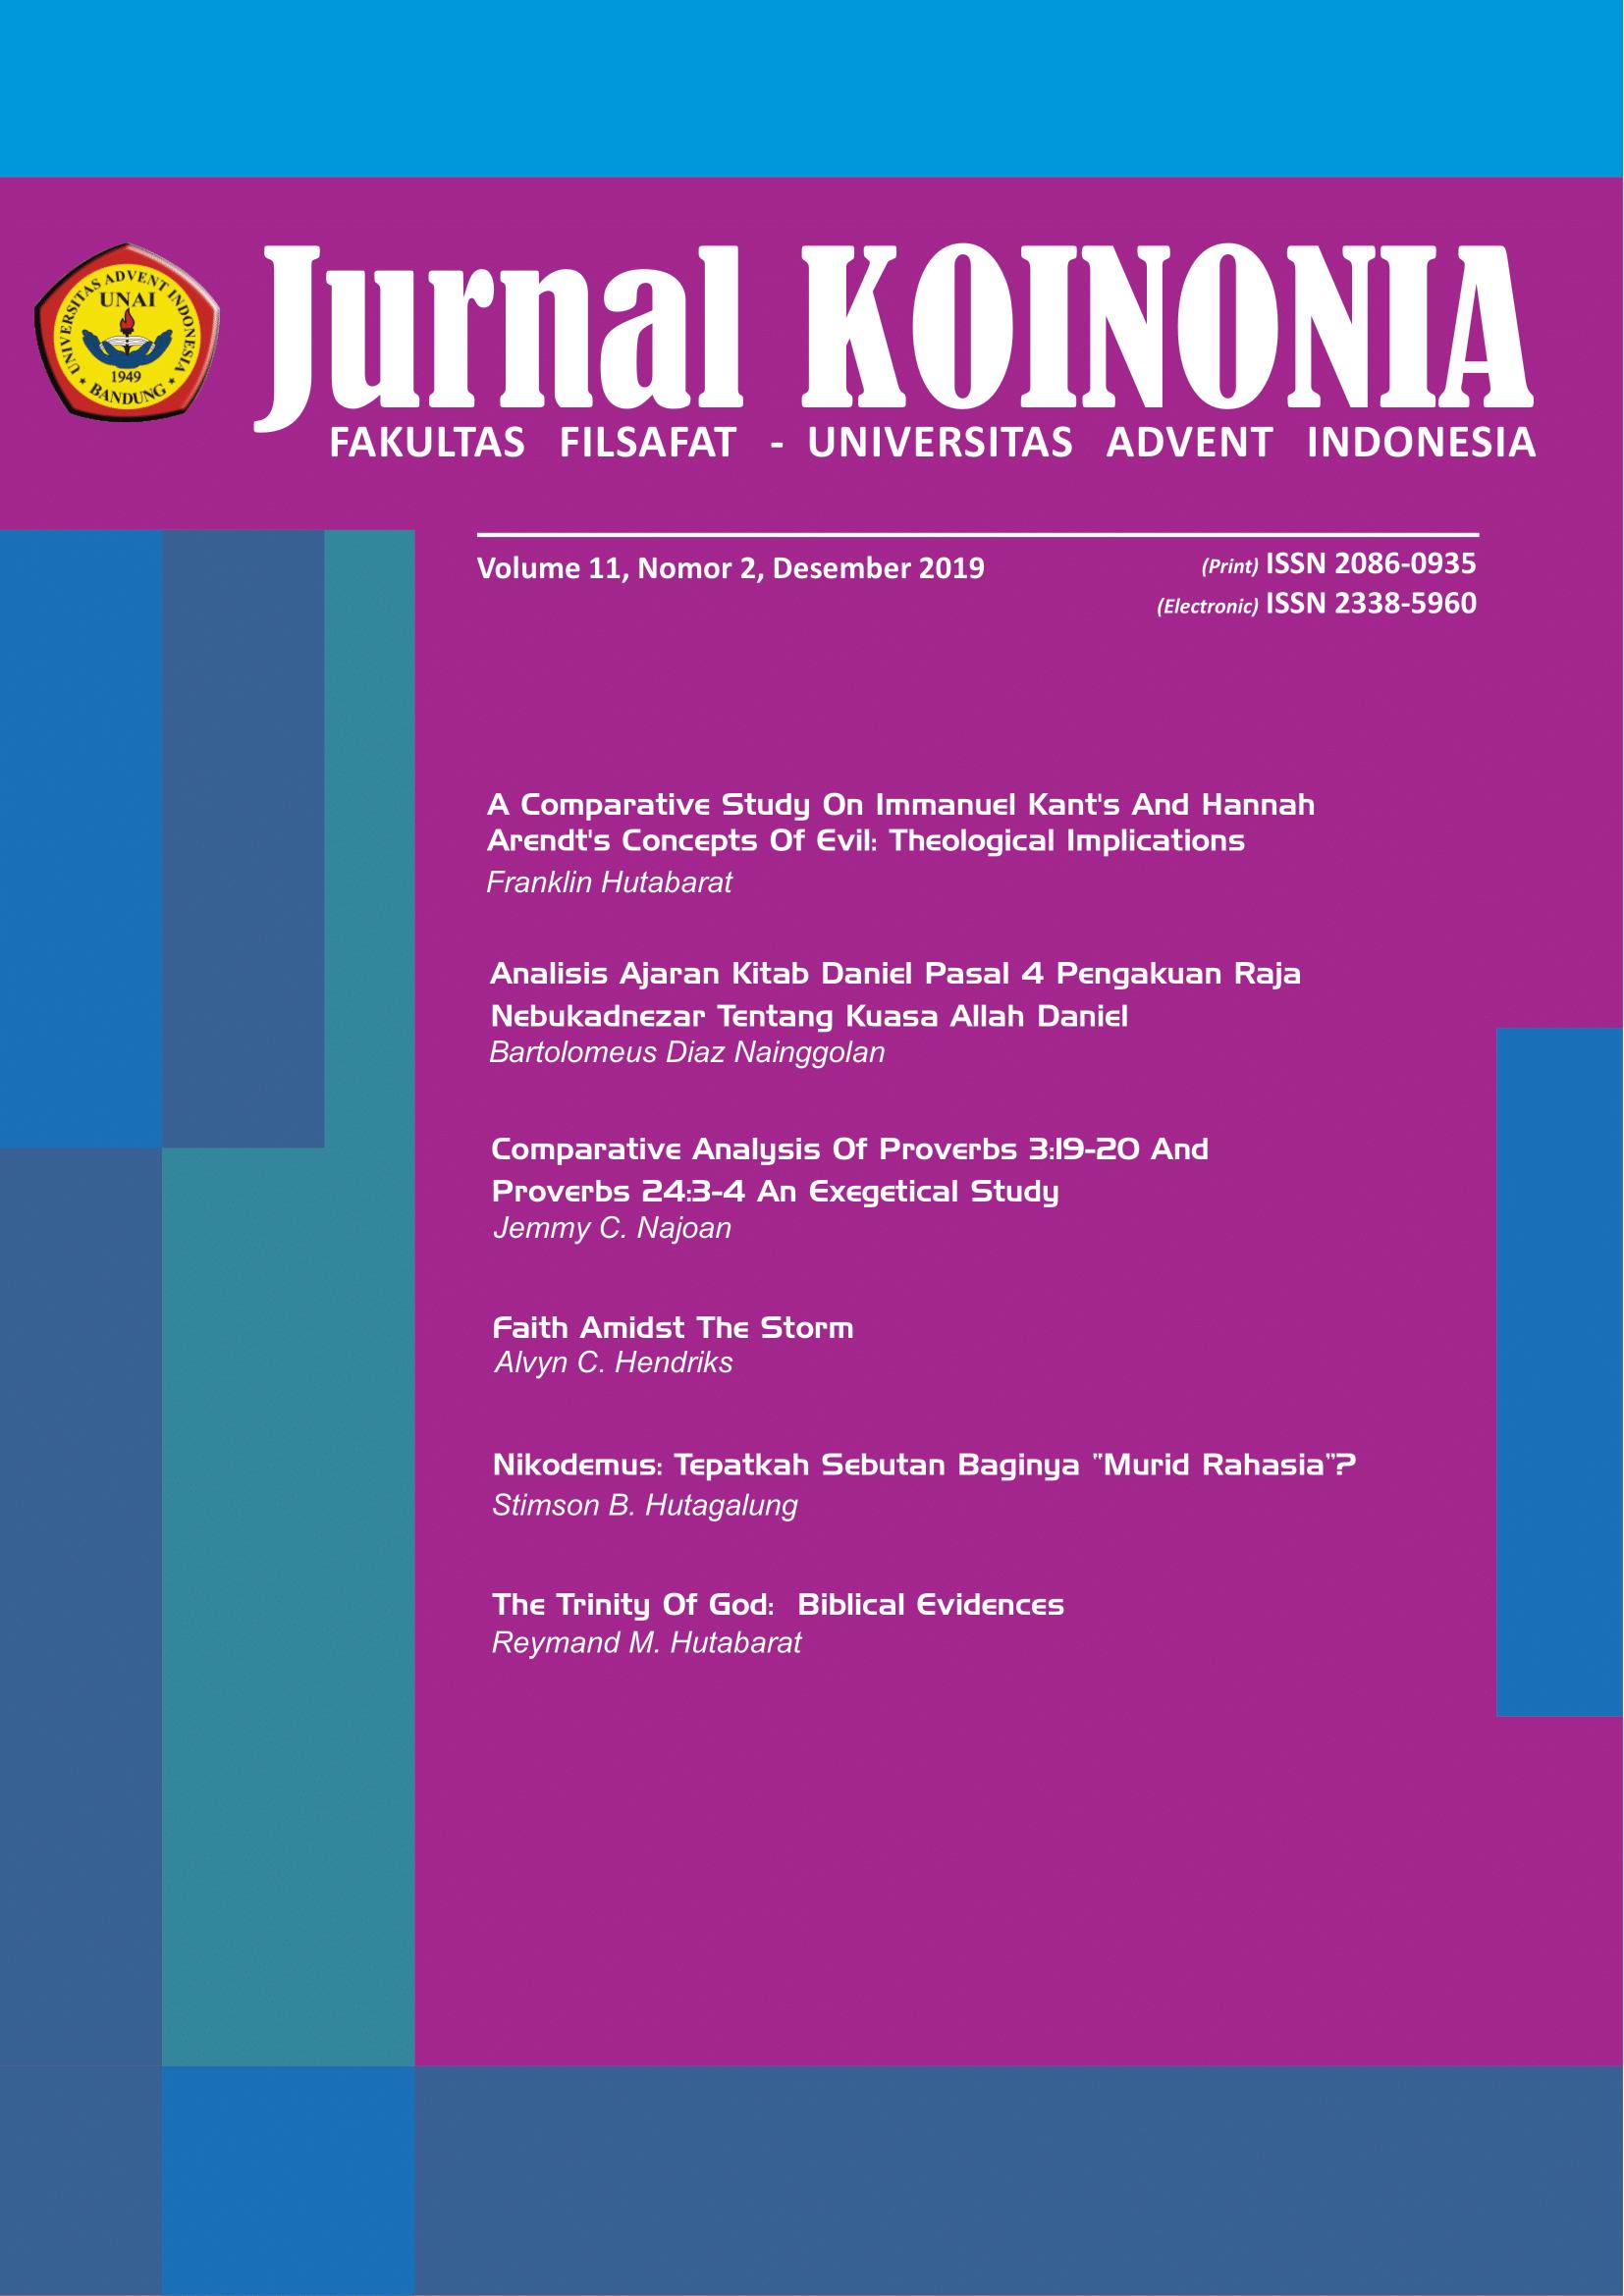 View Vol. 11 No. 2 (2019): KOINONIA: Desember 2019